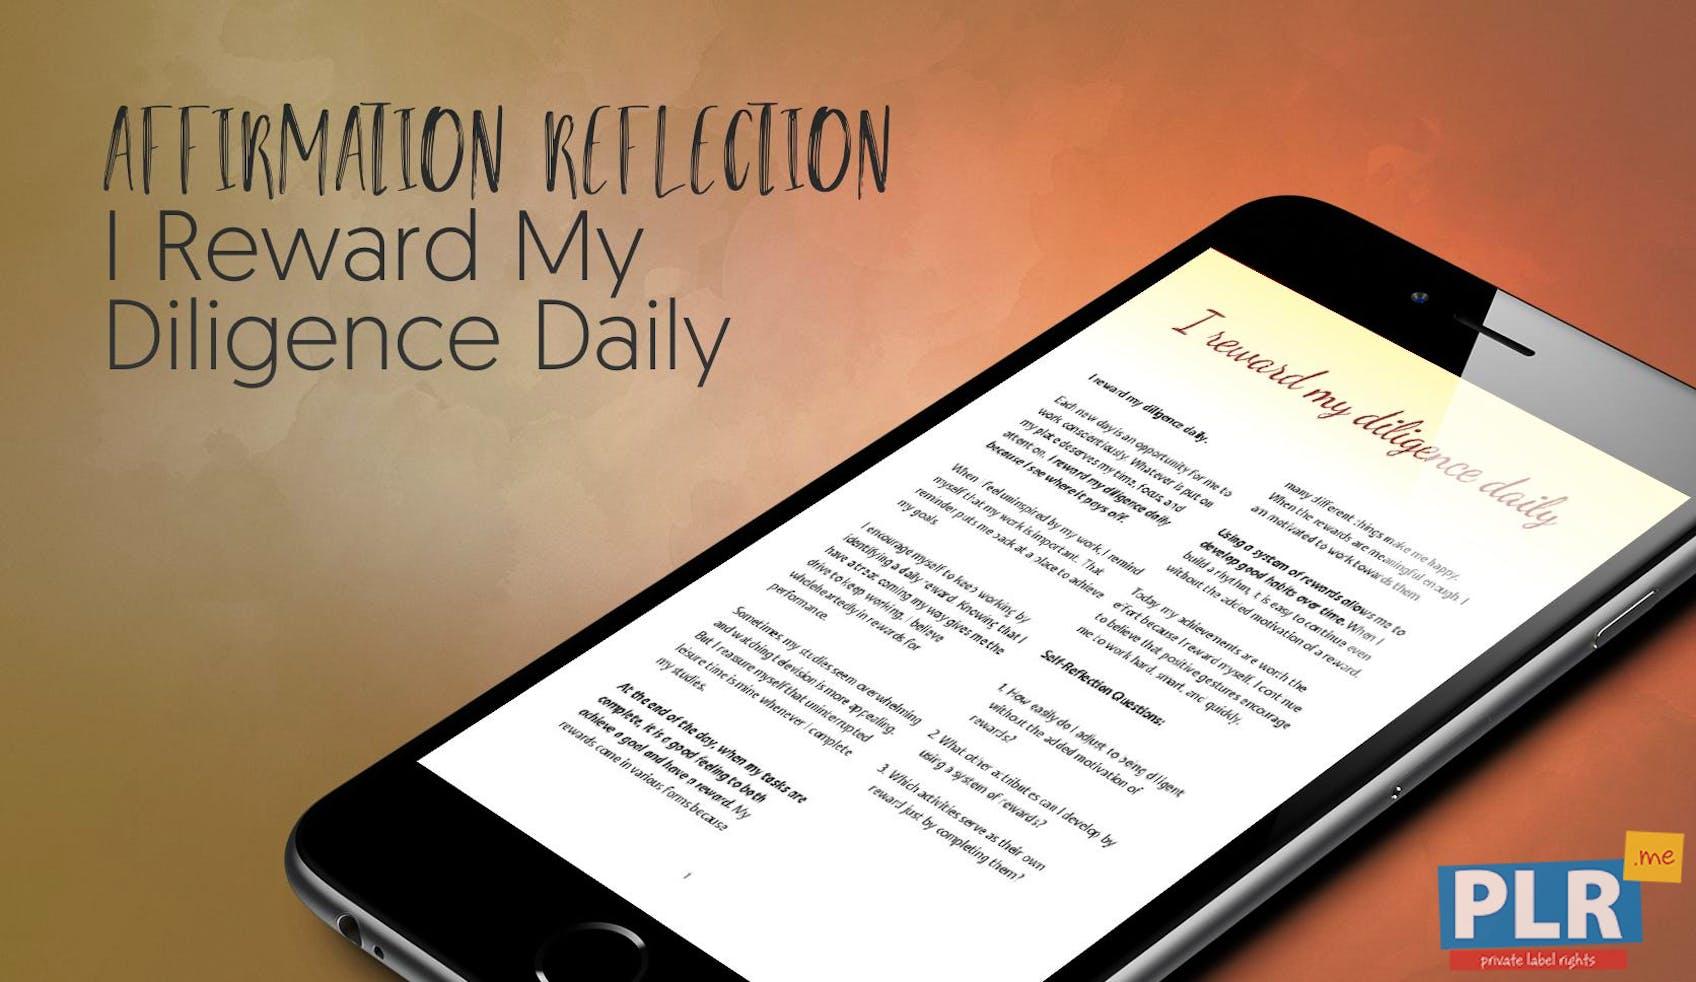 I Reward My Diligence Daily